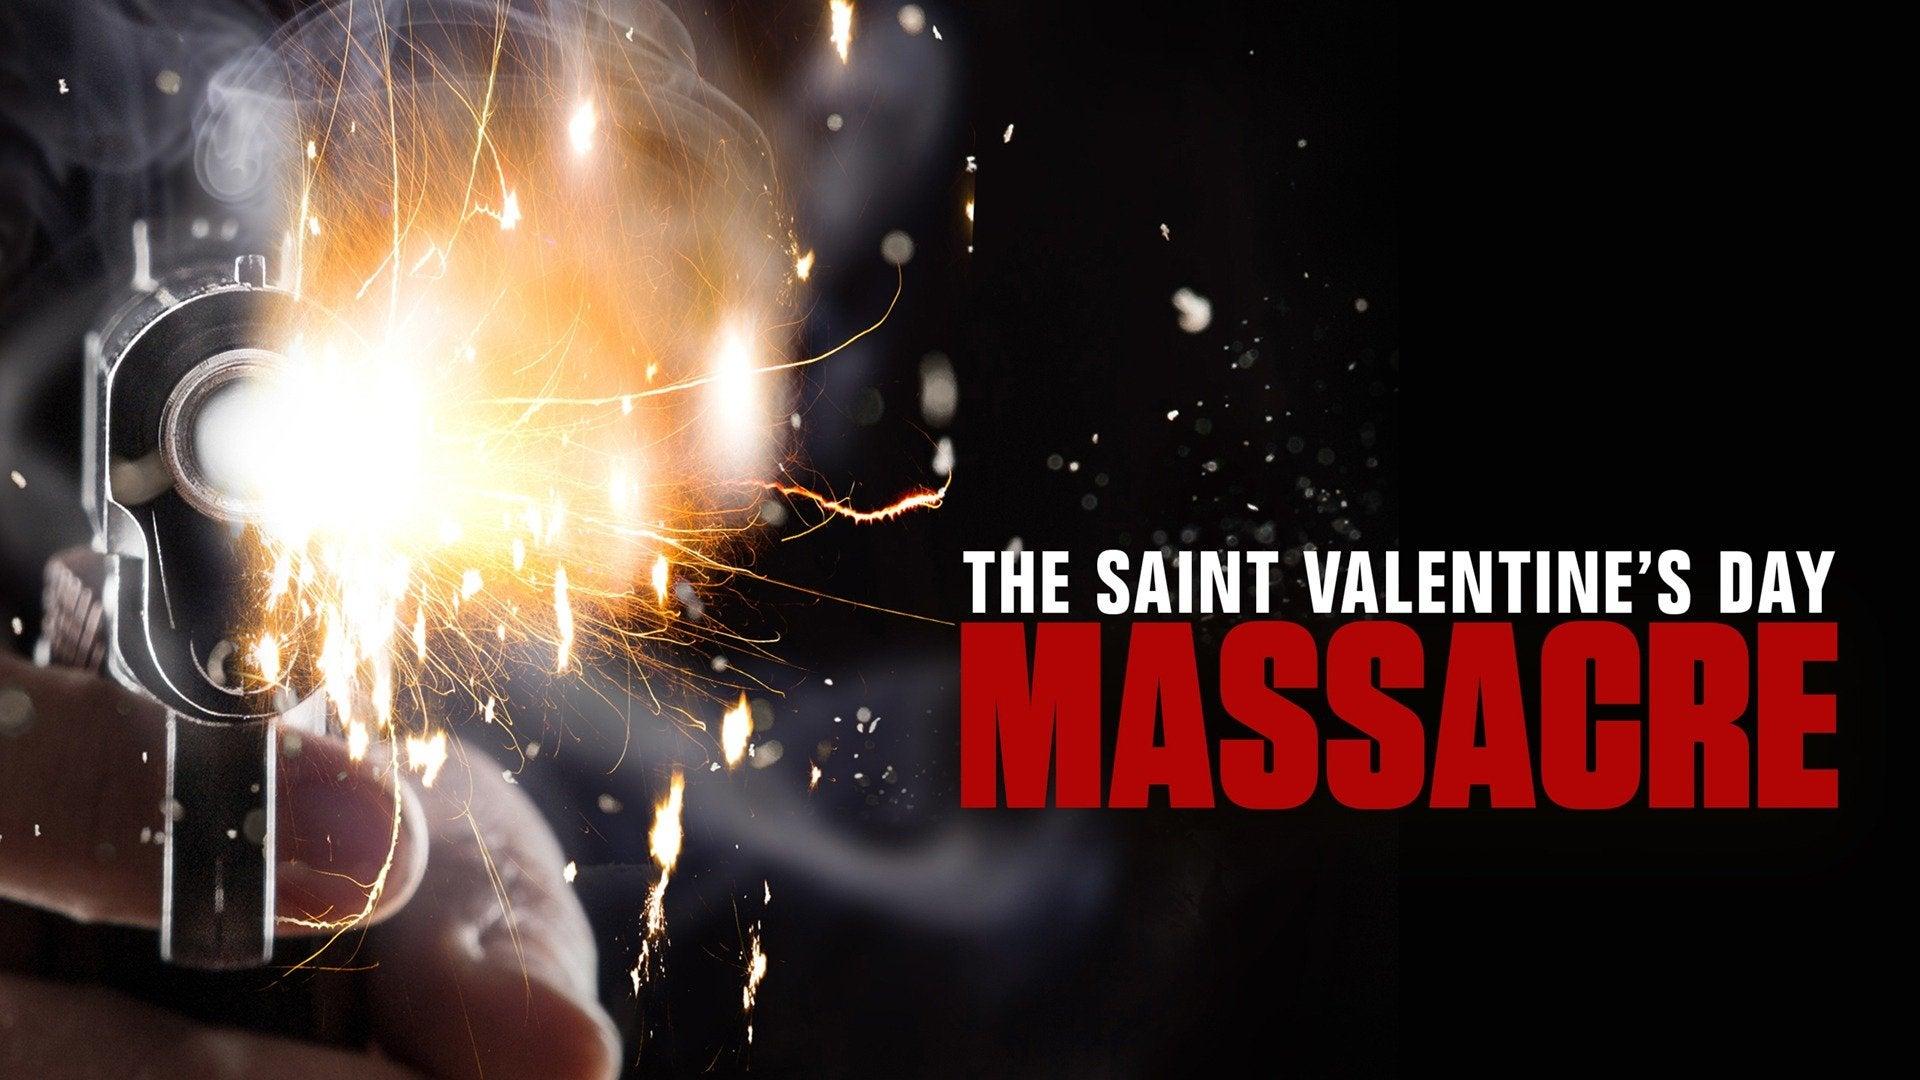 The Saint Valentine's Day Massacre